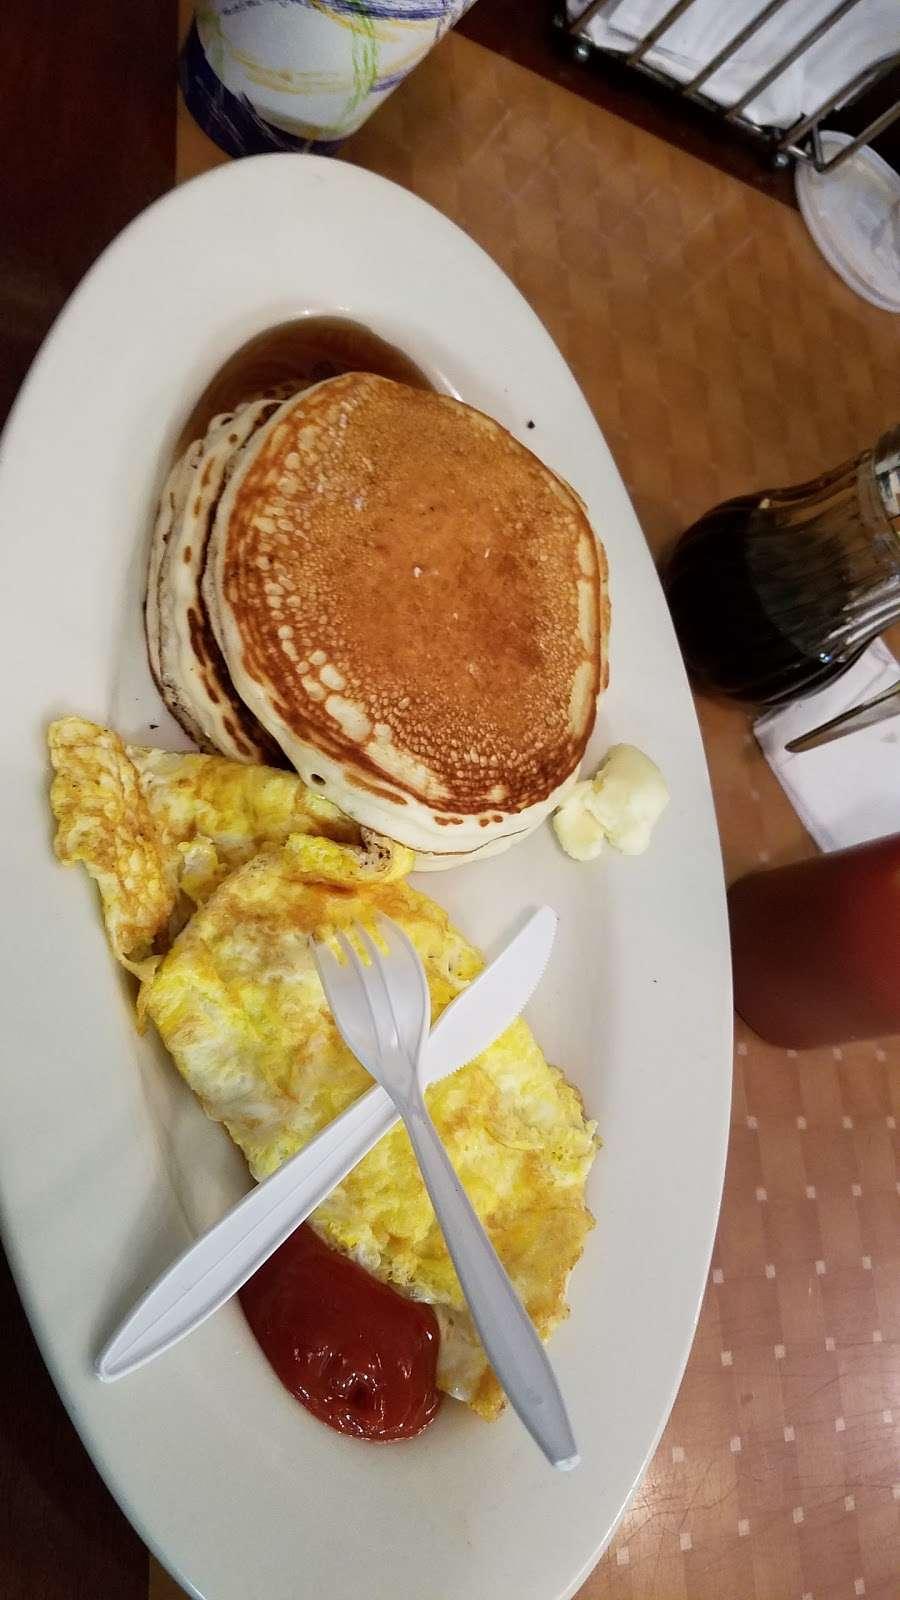 Cafe Con Pan - bakery  | Photo 6 of 10 | Address: 137 Port Richmond Ave, Staten Island, NY 10302, USA | Phone: (347) 352-7098